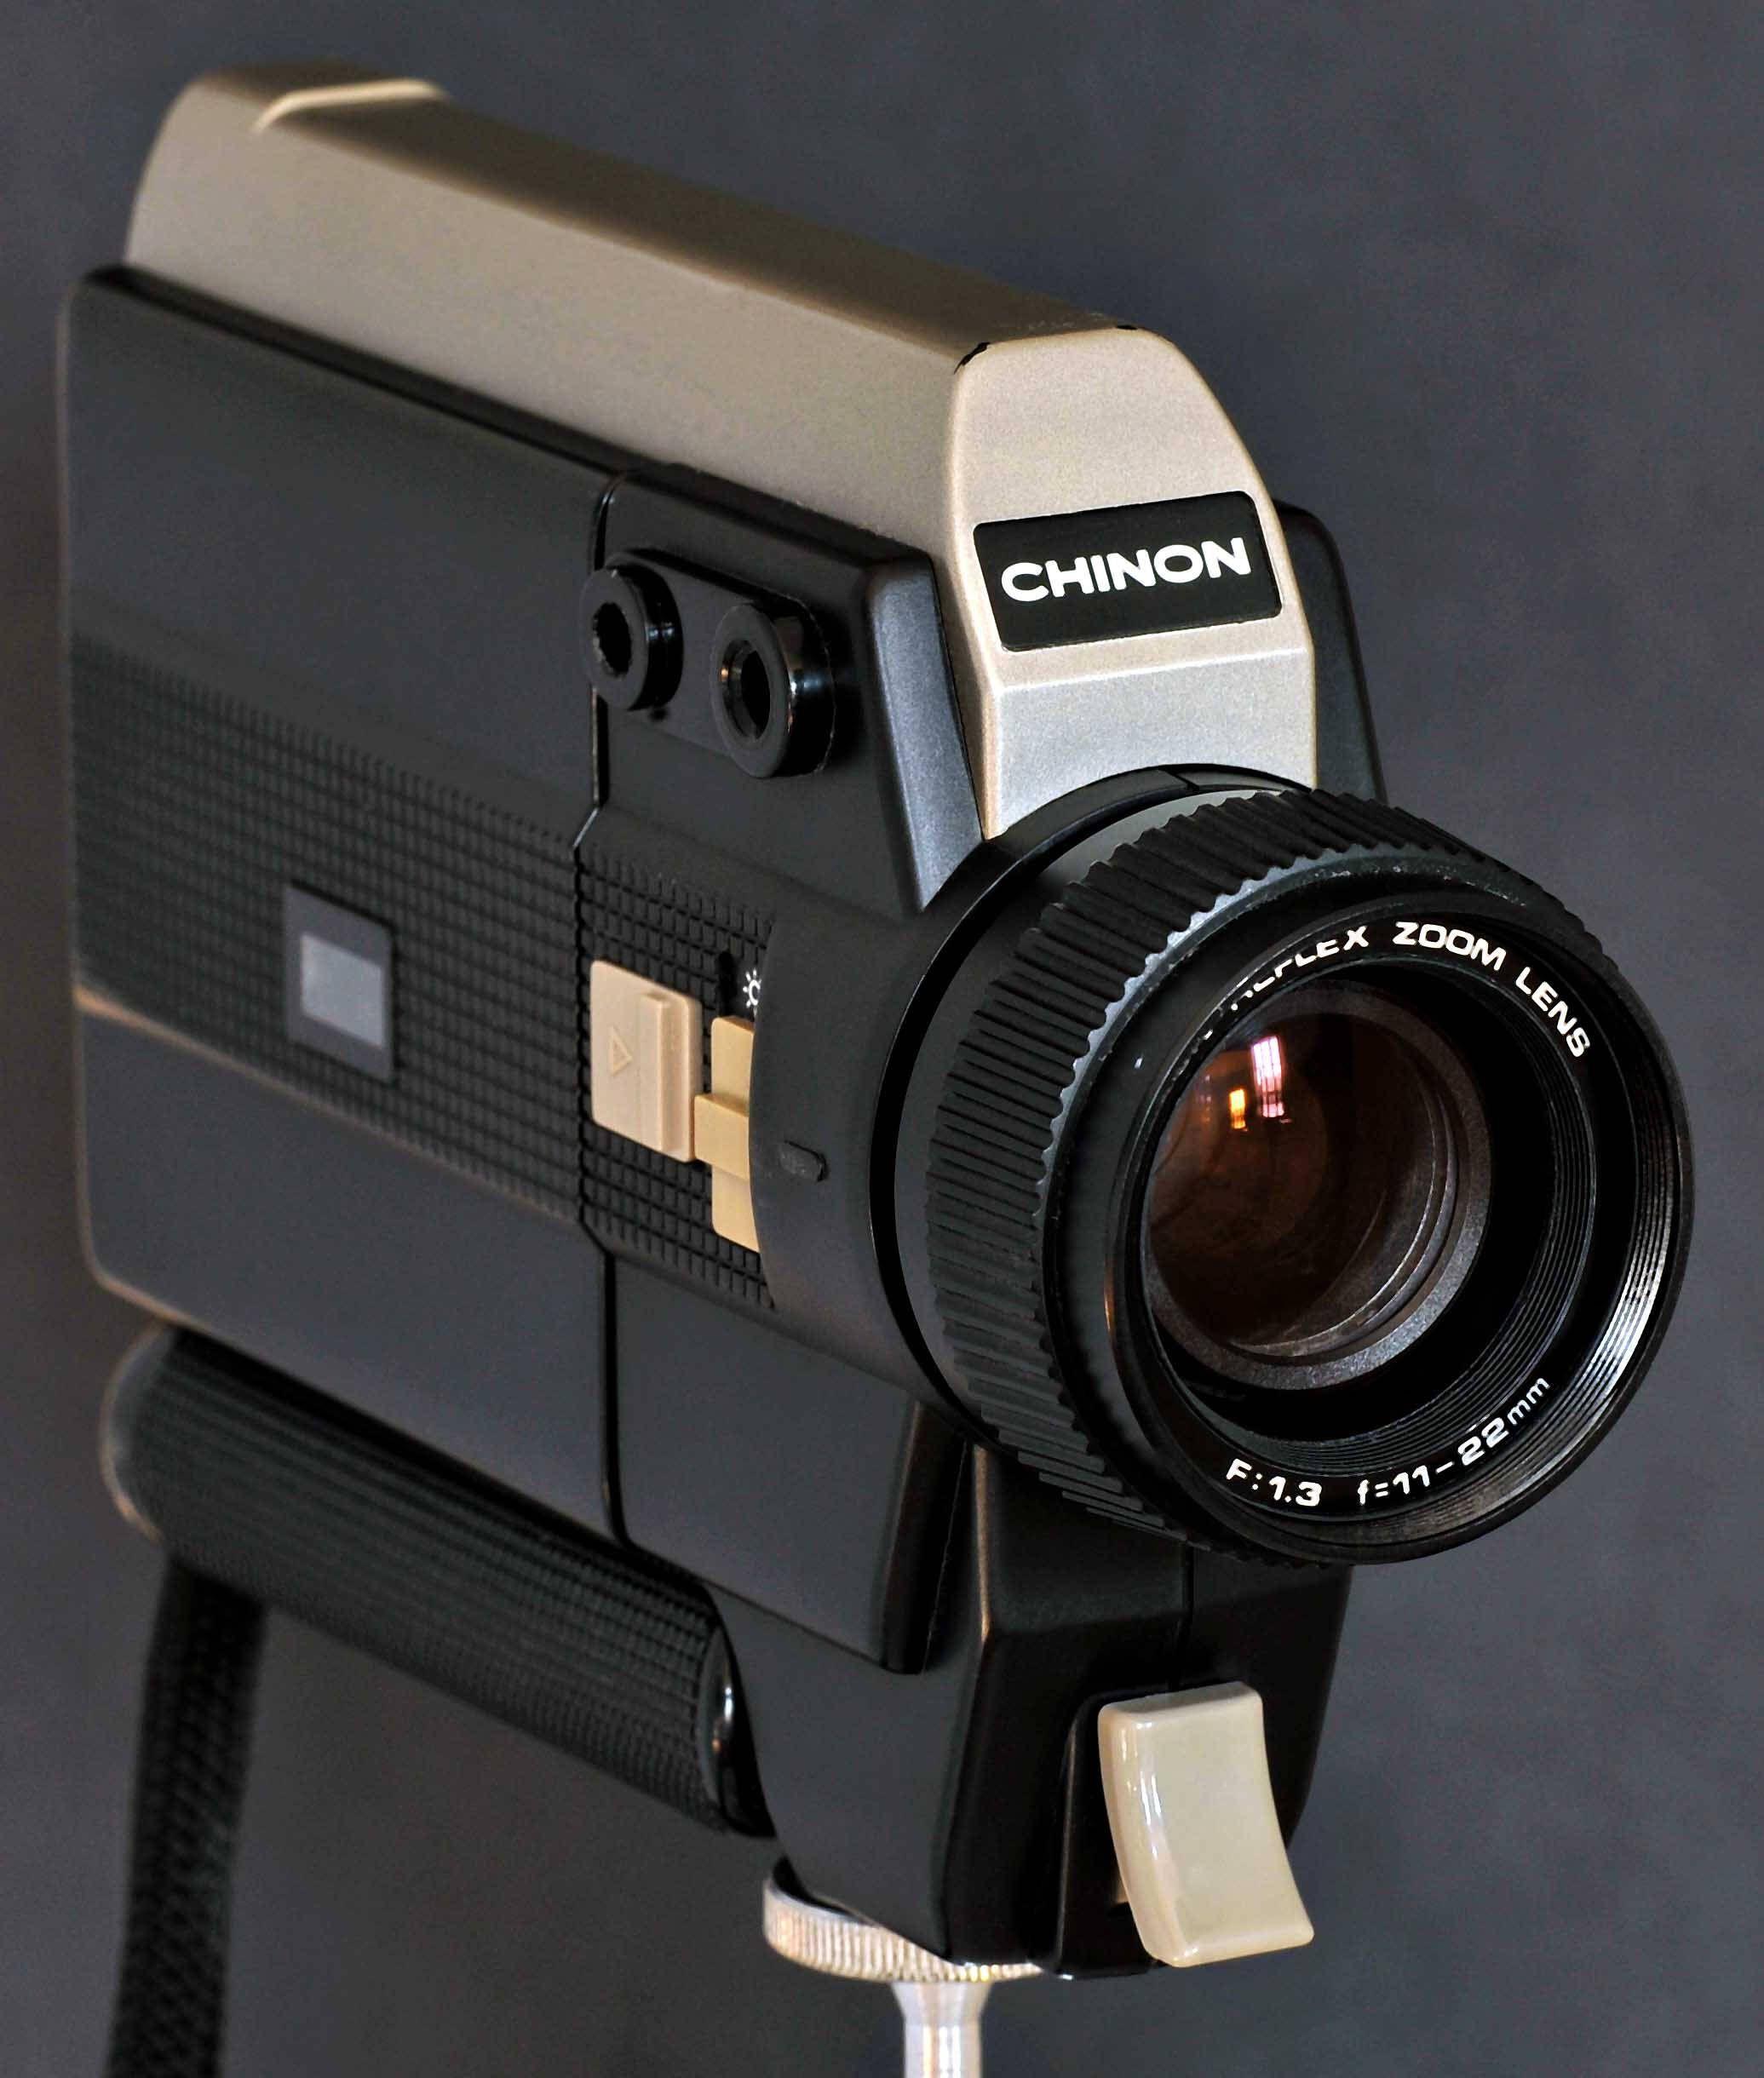 Latest Super 8 Filmmaker Video Camera My Etsy Shop Chinon F 1 3